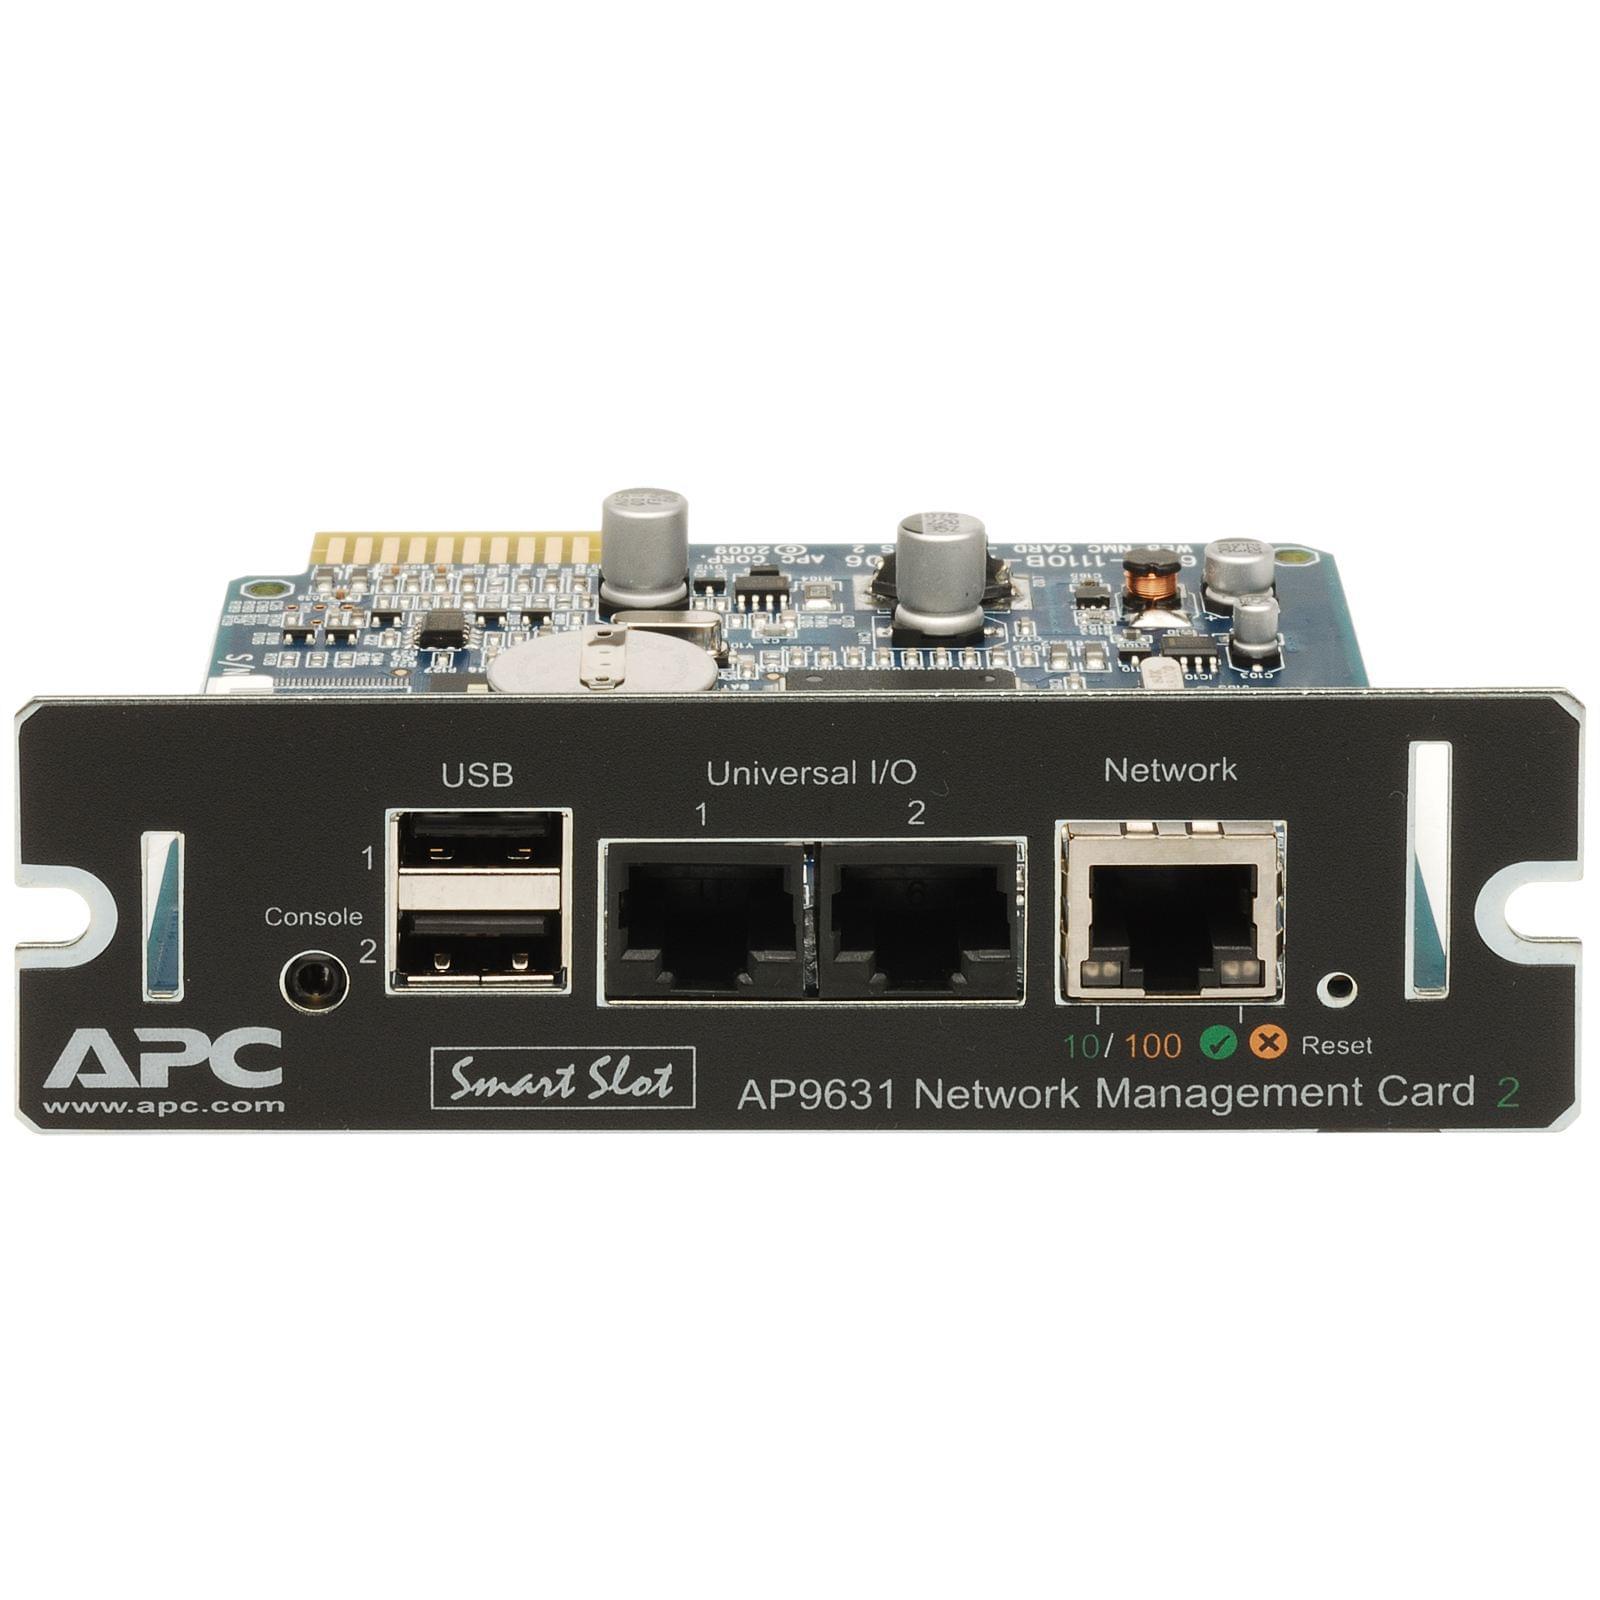 Network Management Card 2 AP9631 - Onduleur APC - Cybertek.fr - 0